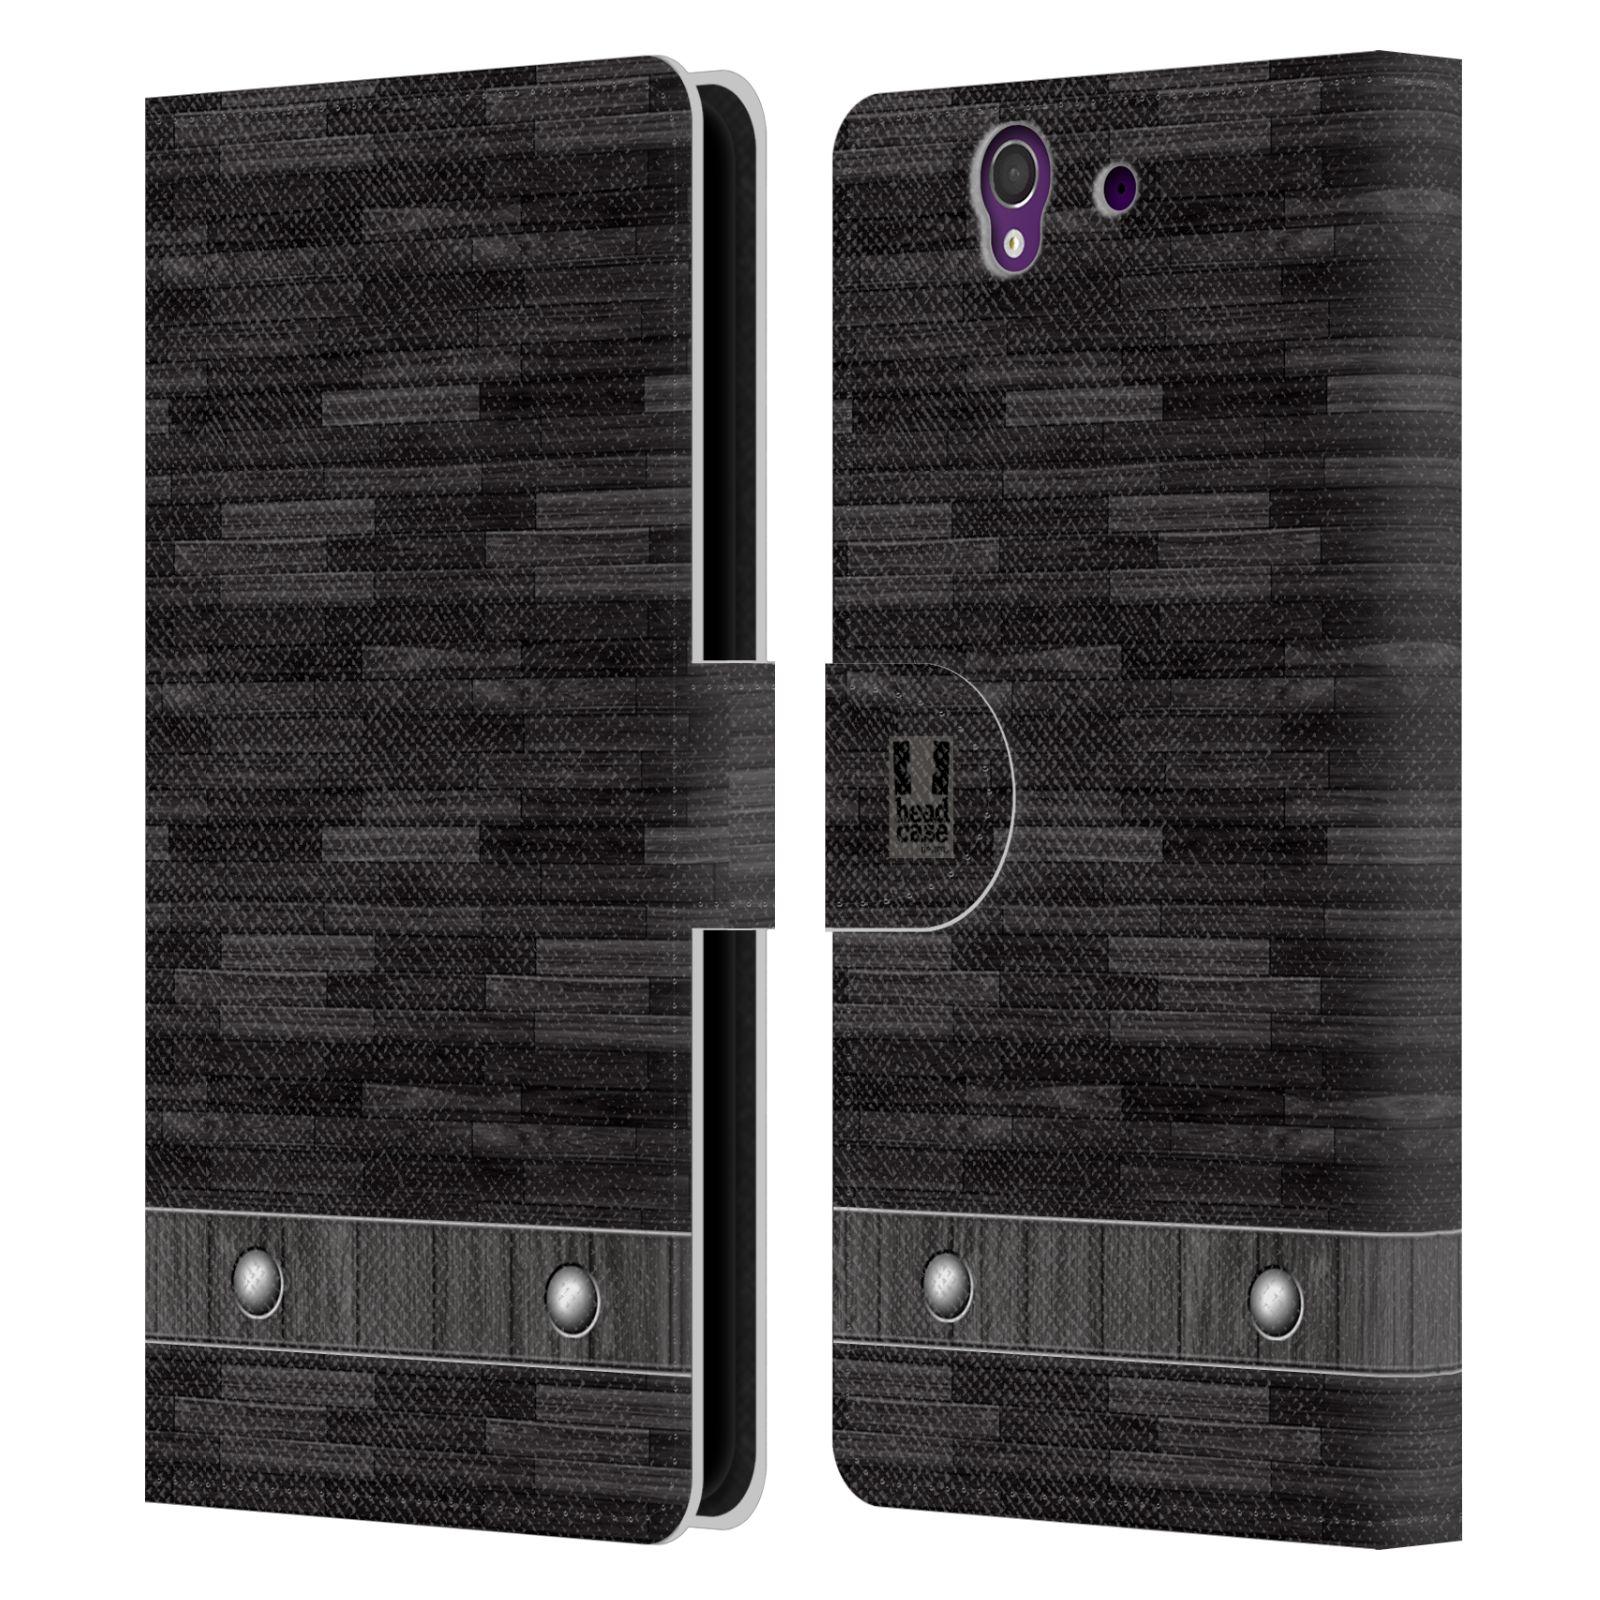 HEAD CASE Flipové pouzdro pro mobil SONY XPERIA Z (C6603) stavební textury dřevo černá barva